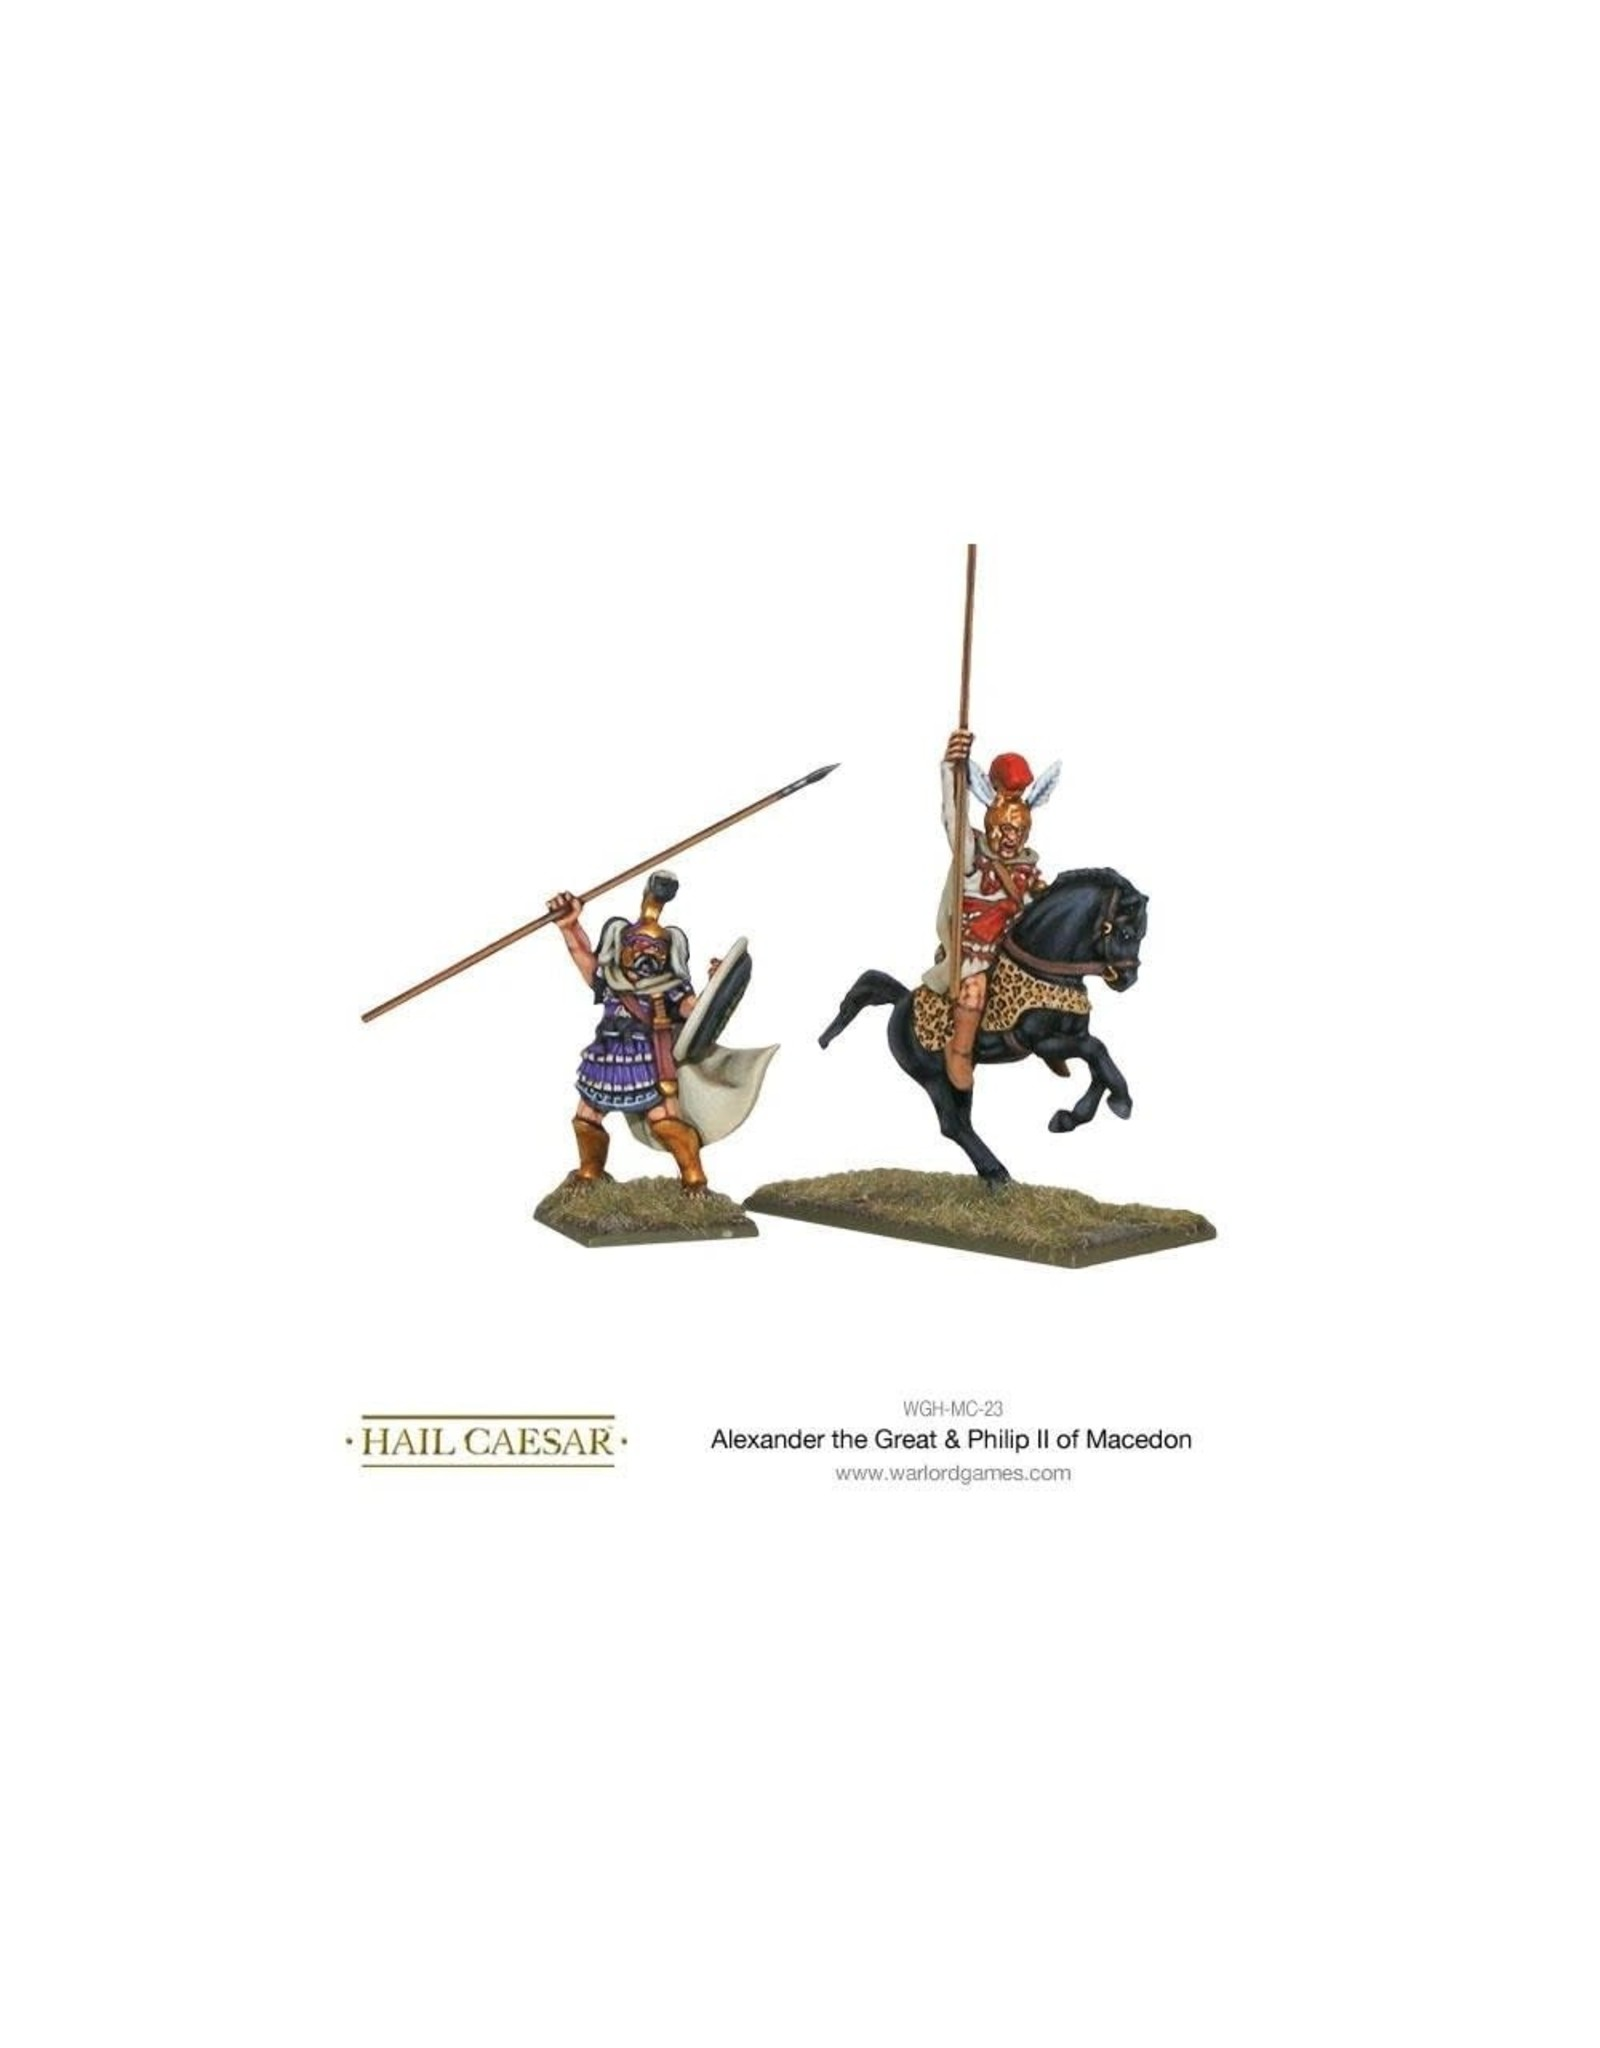 ALEXANDER THE GREAT & PHILIP II OF MACEDON